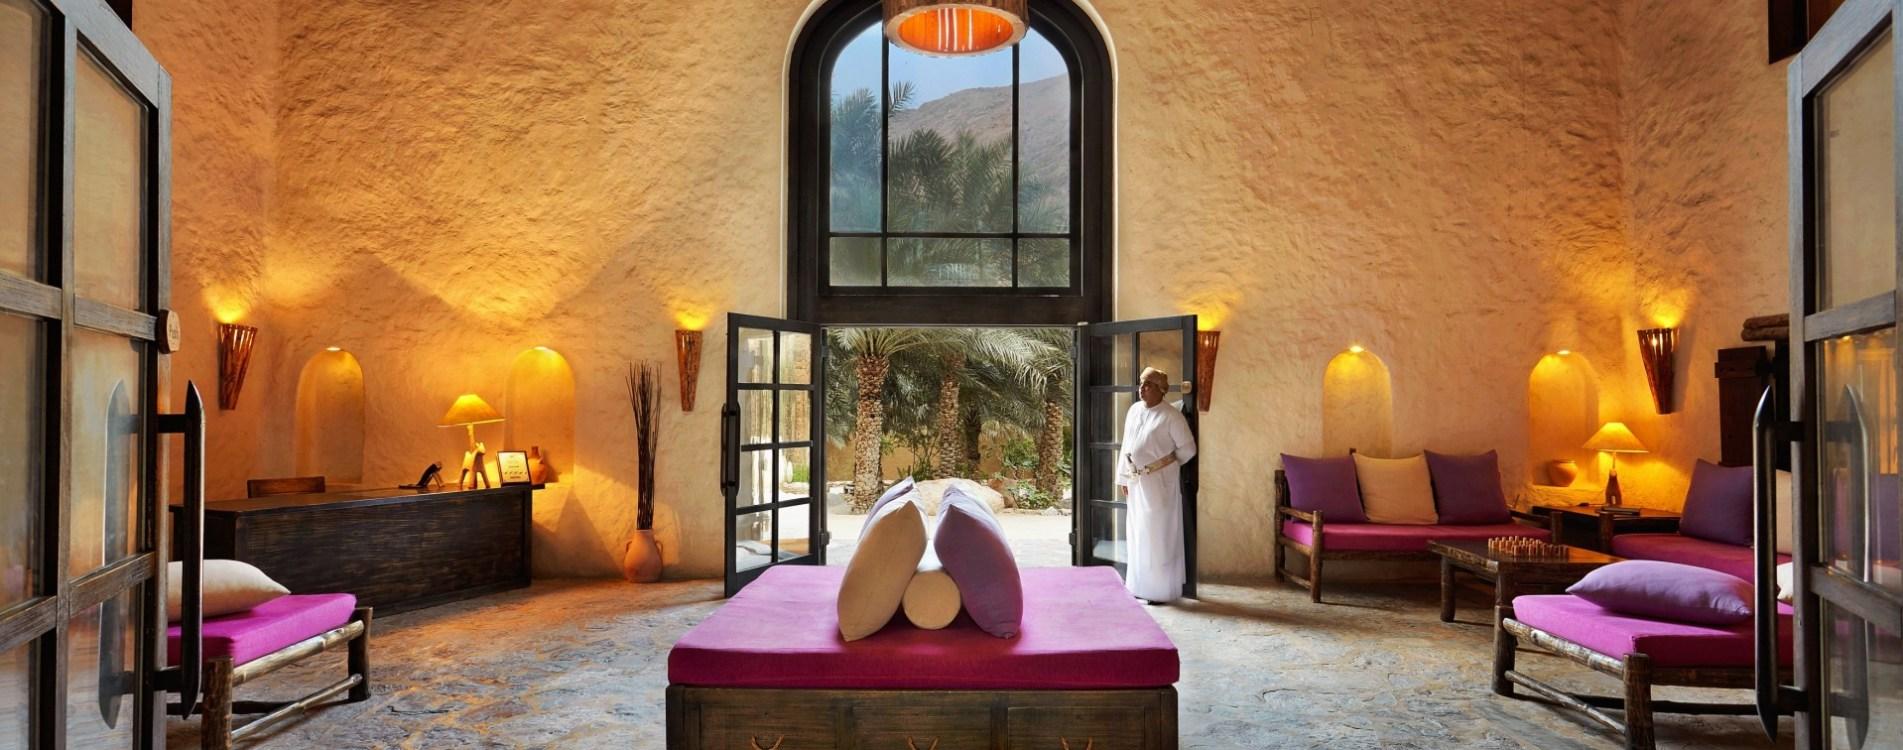 Six-Senses-Zighy-Bay-Sablah-Lobby-Hauptbereich-Oman.jpg